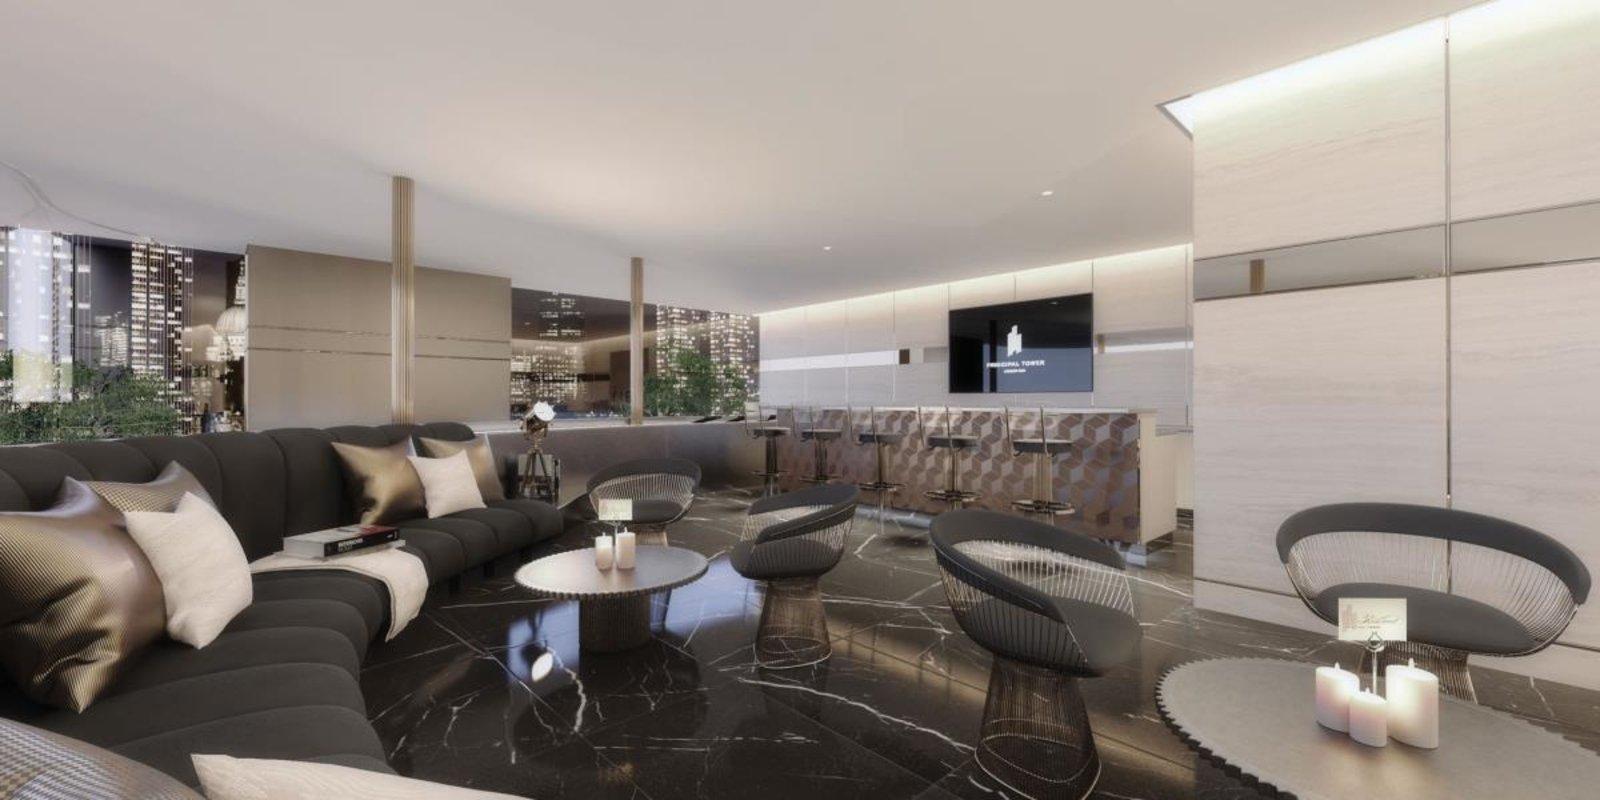 Apartment-for-sale-London-london-1115-view8